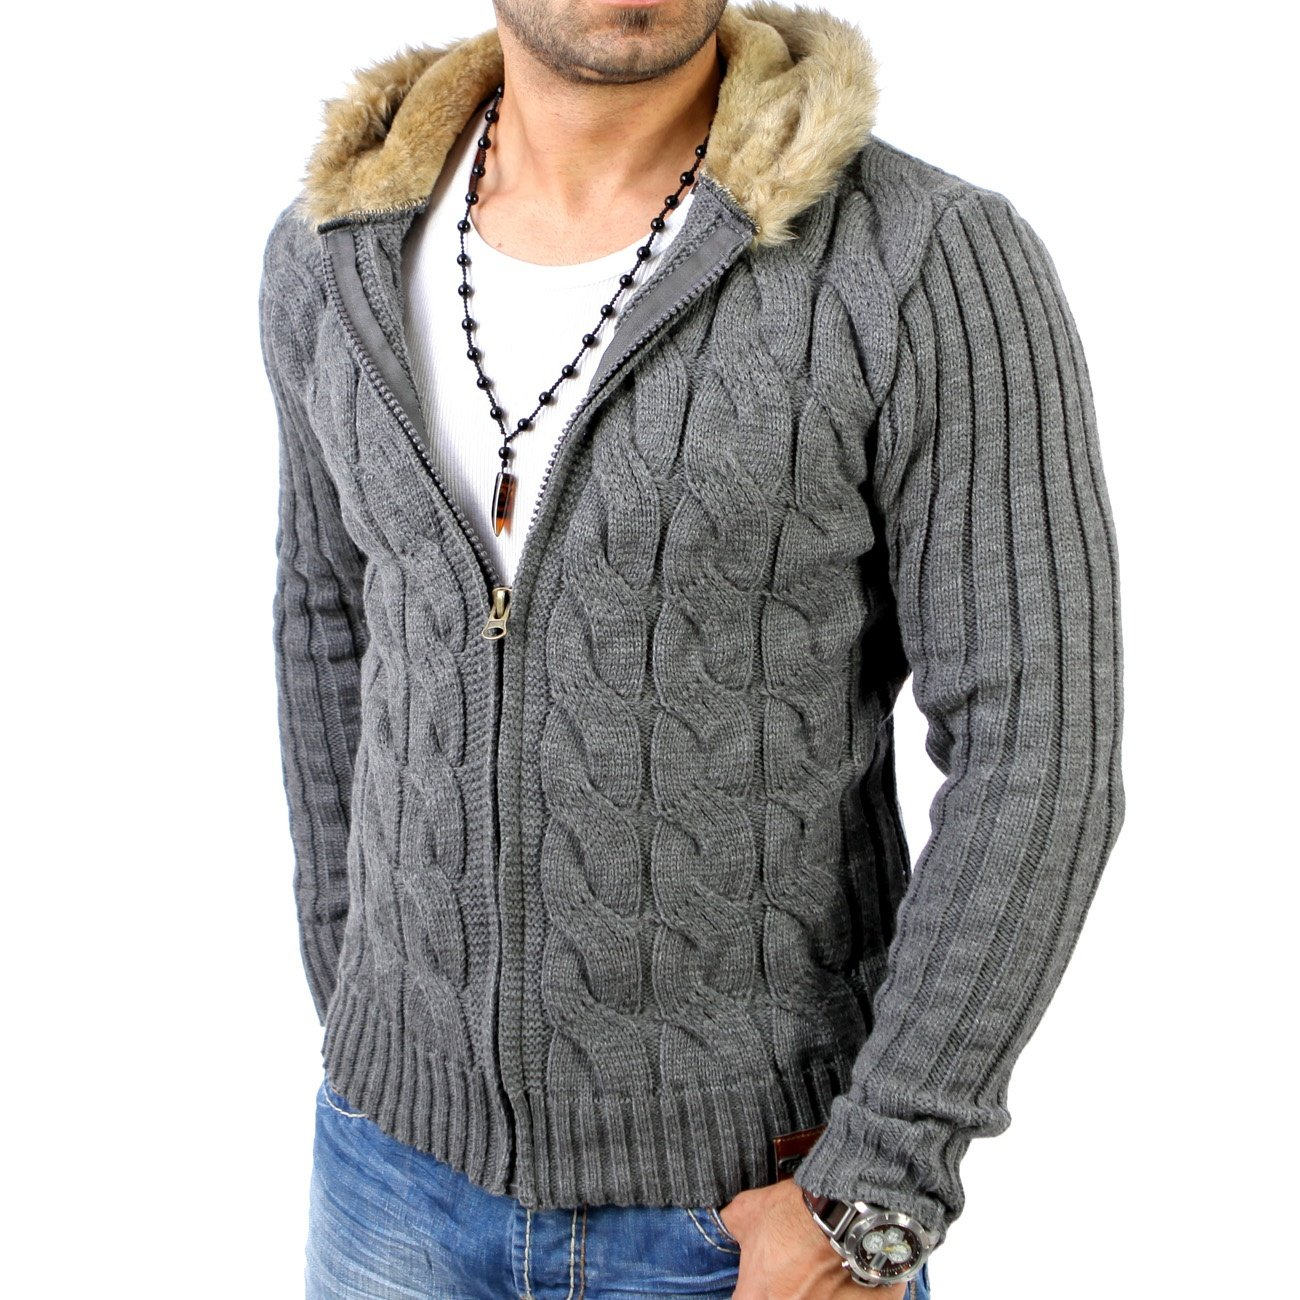 tazzio tz 3988 grobstrick winter jacke kapuzen pullover d grau. Black Bedroom Furniture Sets. Home Design Ideas